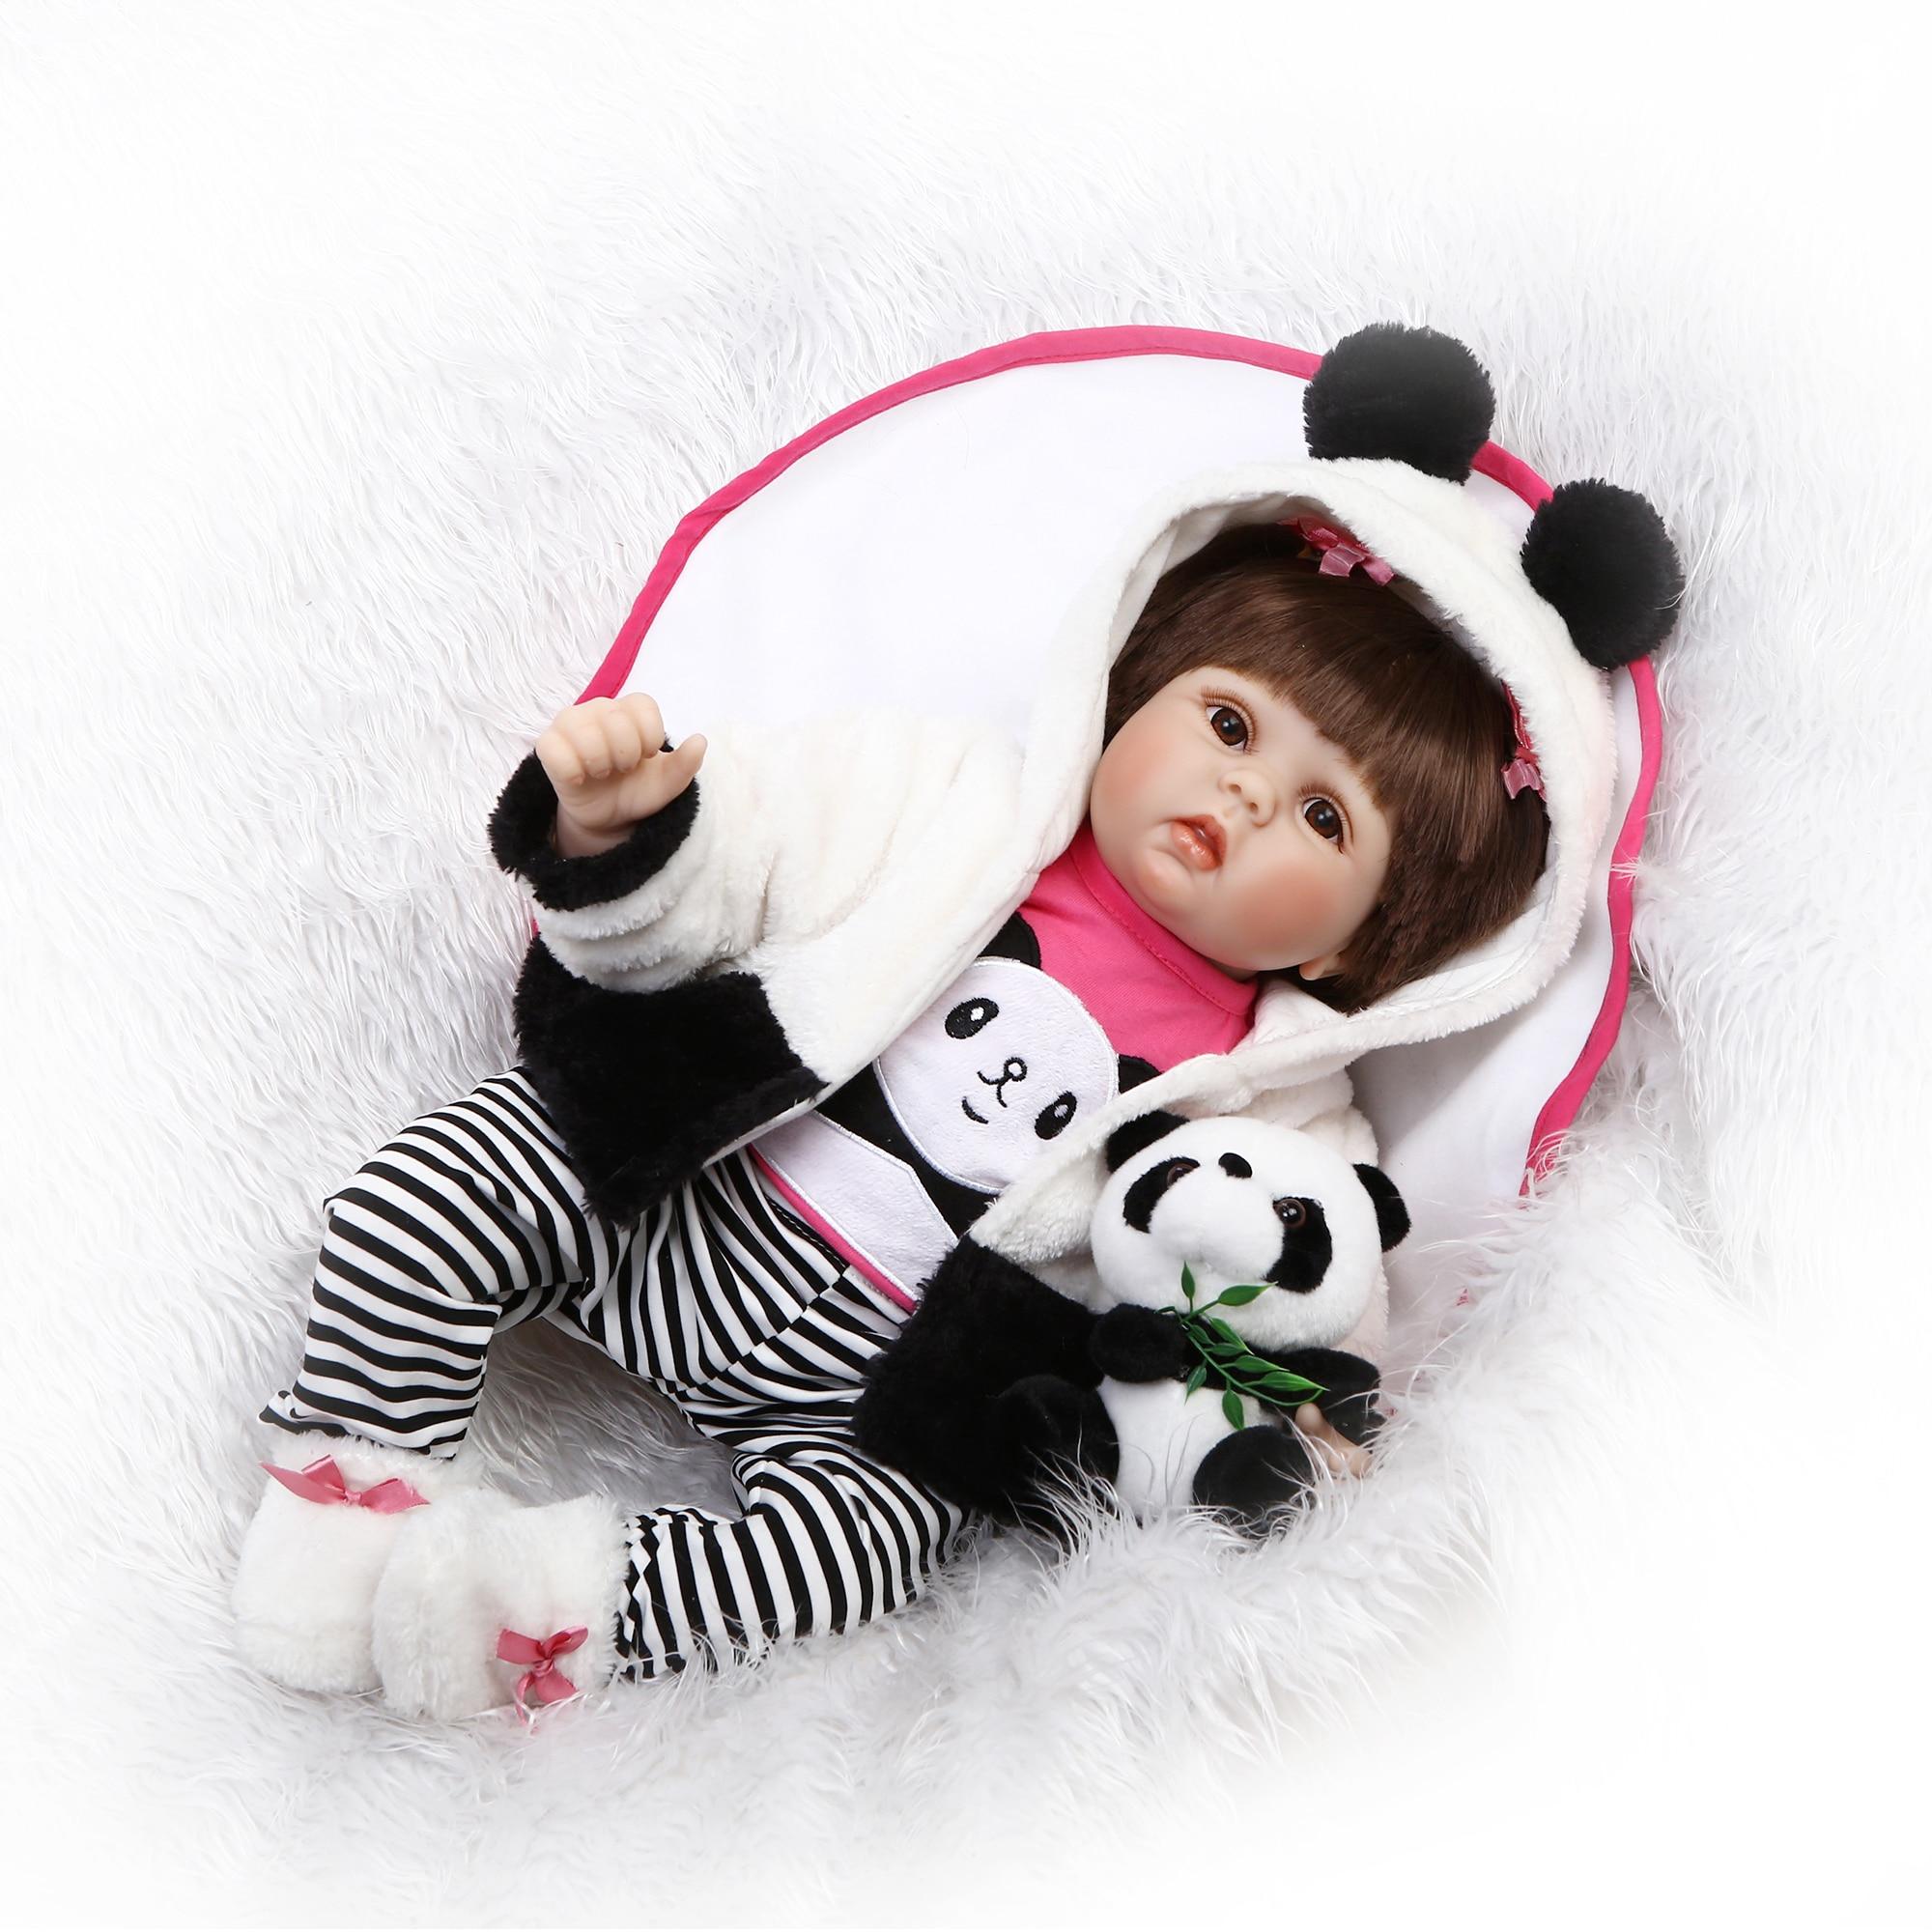 NPKCOLLECTION 22 Soft Silicone Vinyl Newborn Doll Cloth Body Panda Clothes Adorable Realistic Baby Newborn Bebe Alive DollNPKCOLLECTION 22 Soft Silicone Vinyl Newborn Doll Cloth Body Panda Clothes Adorable Realistic Baby Newborn Bebe Alive Doll